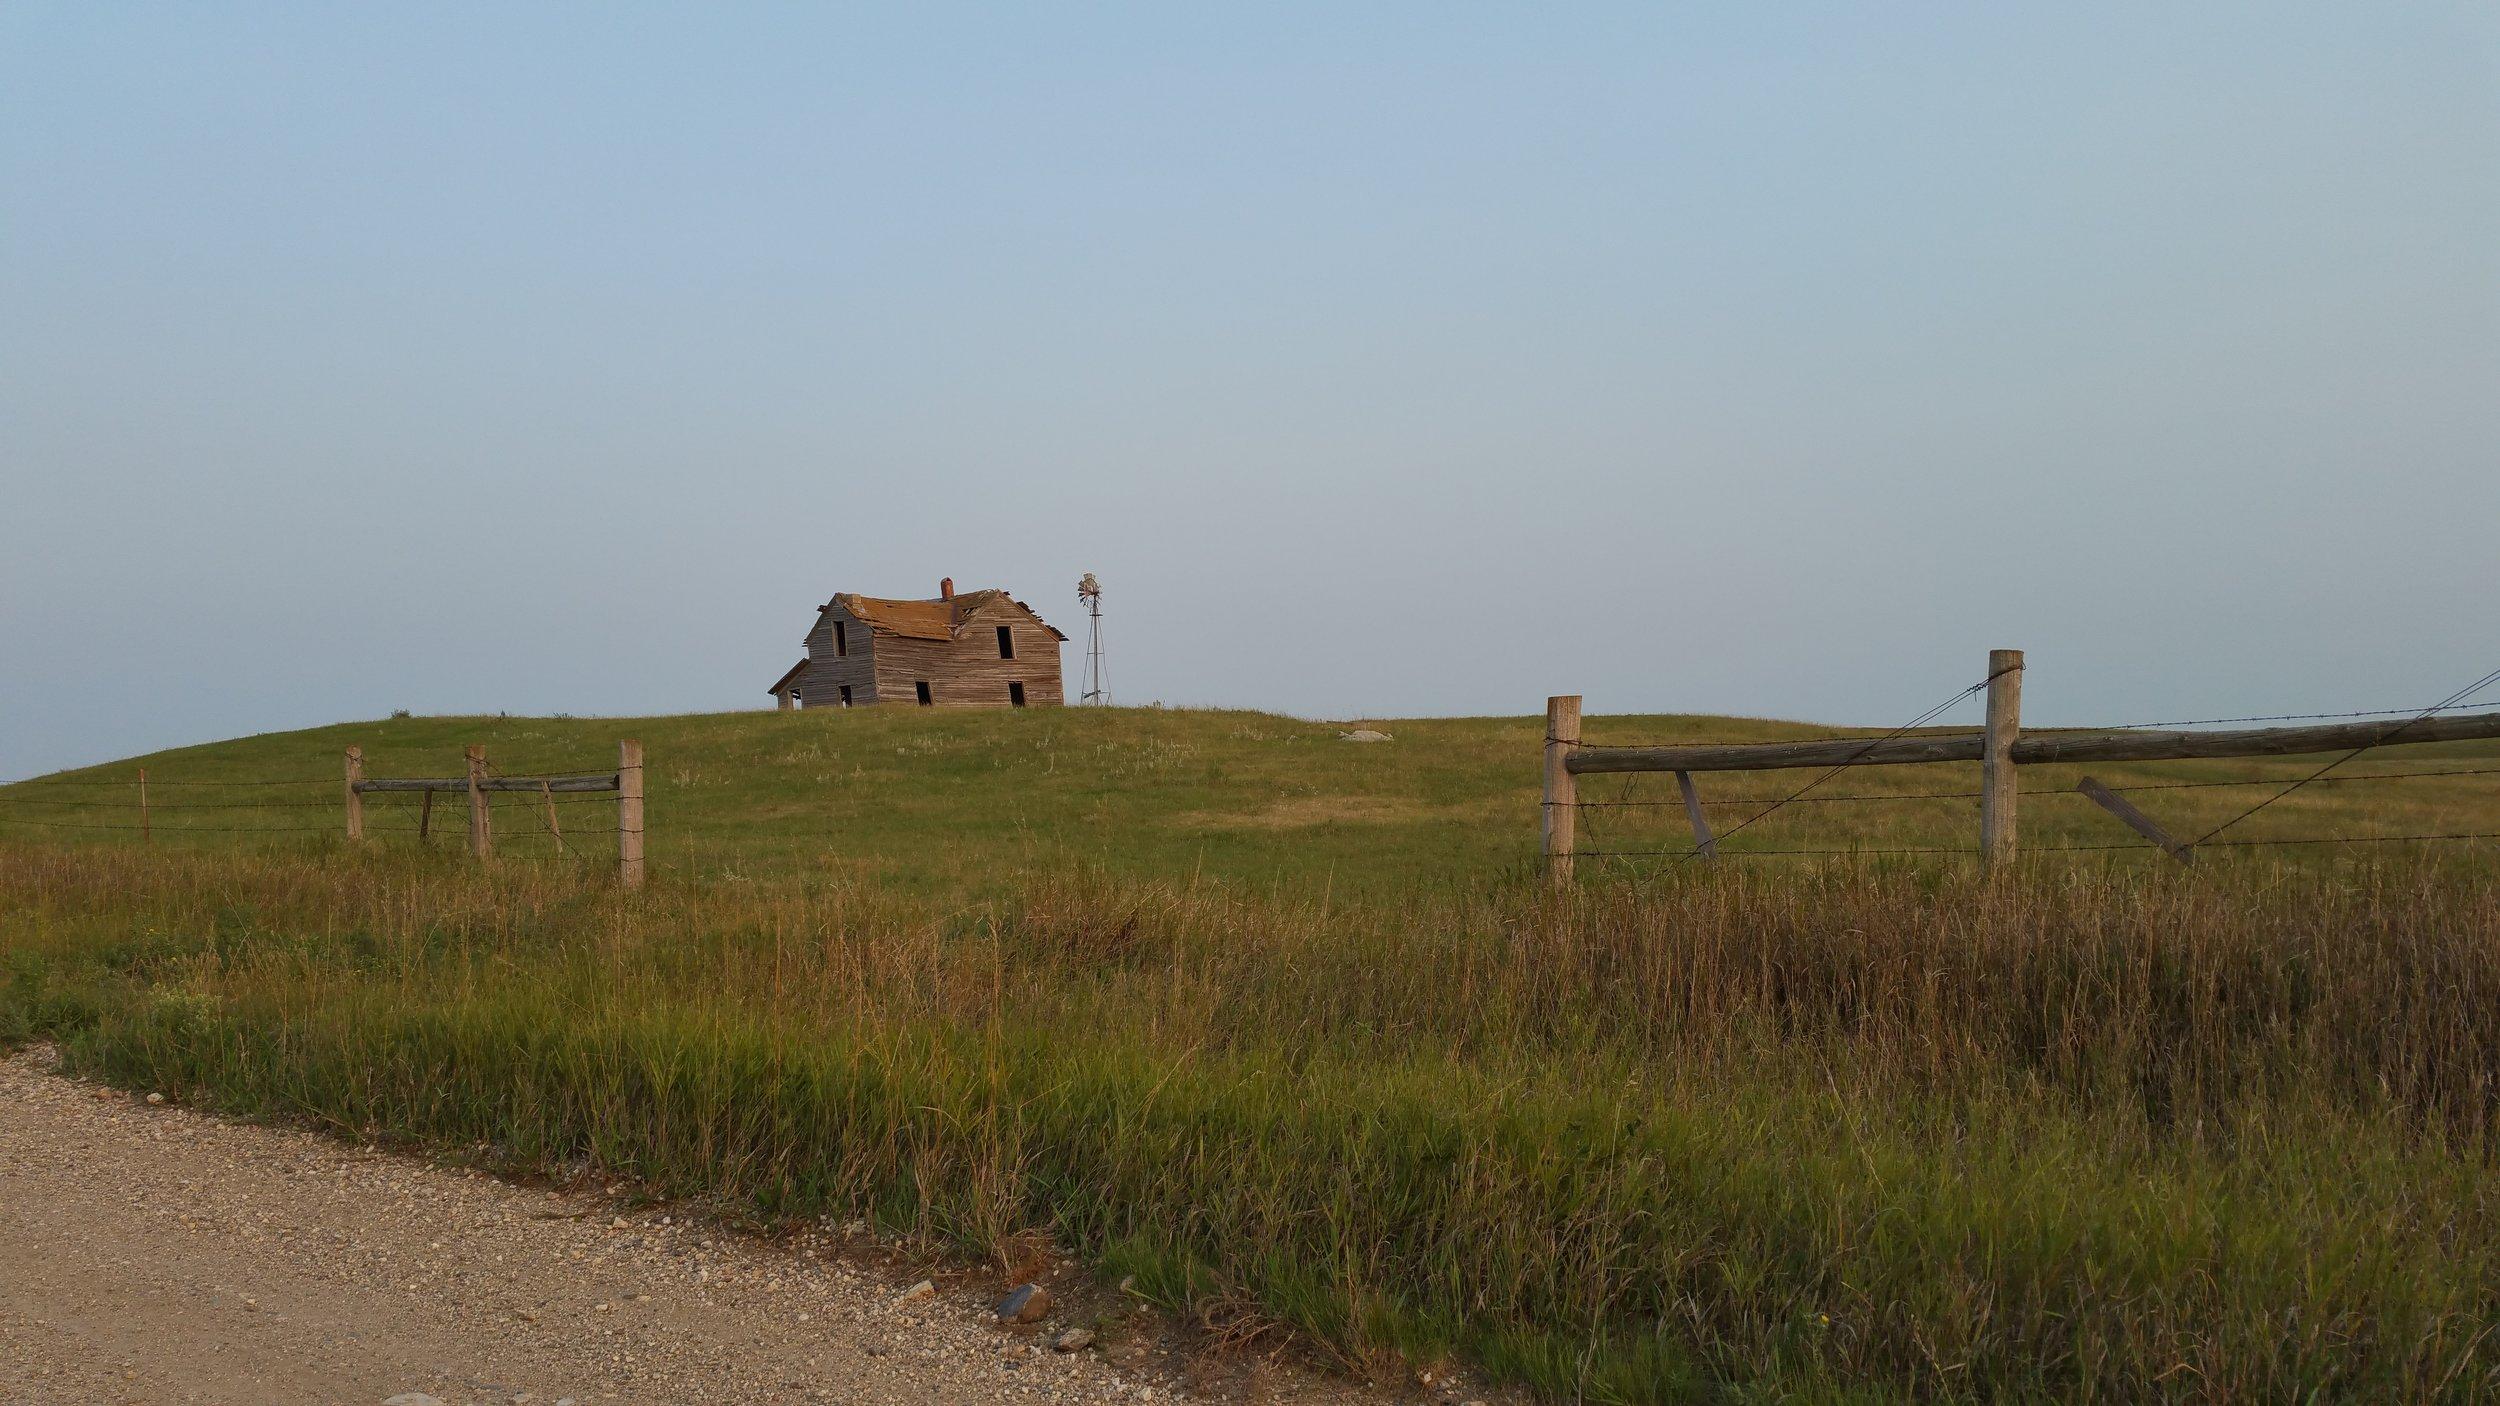 prairie scene